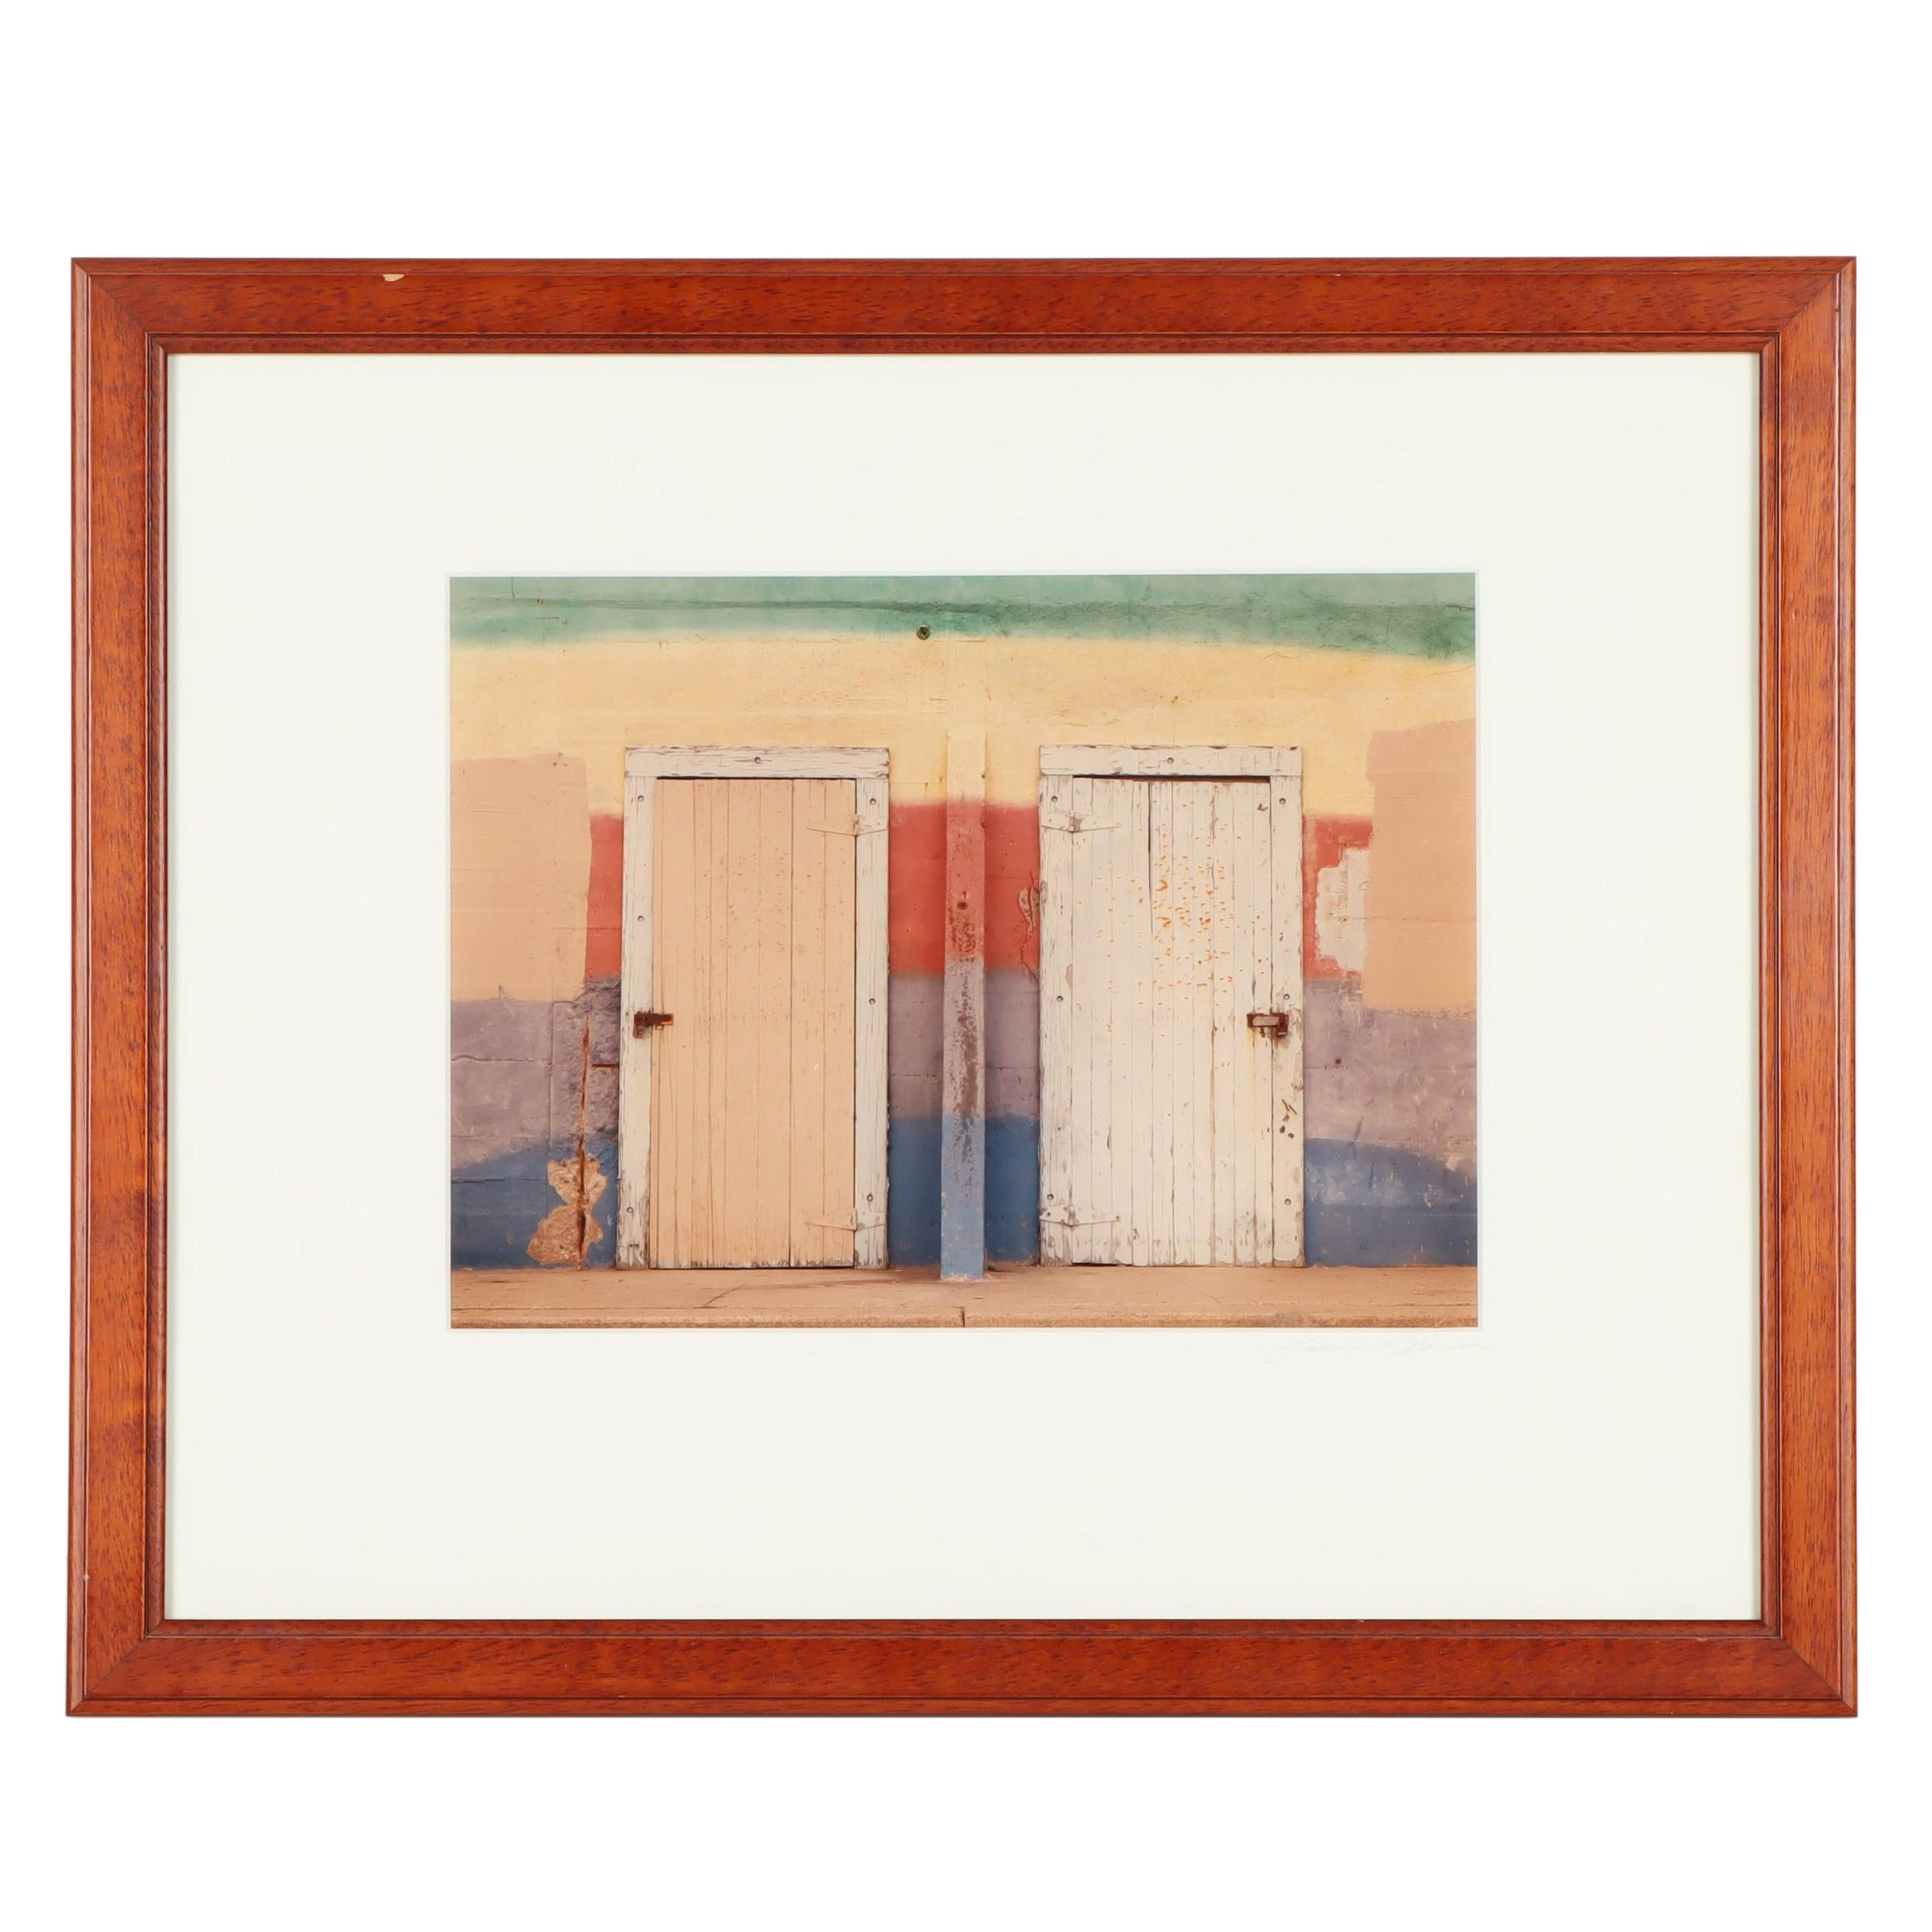 Giclée of Two Doors